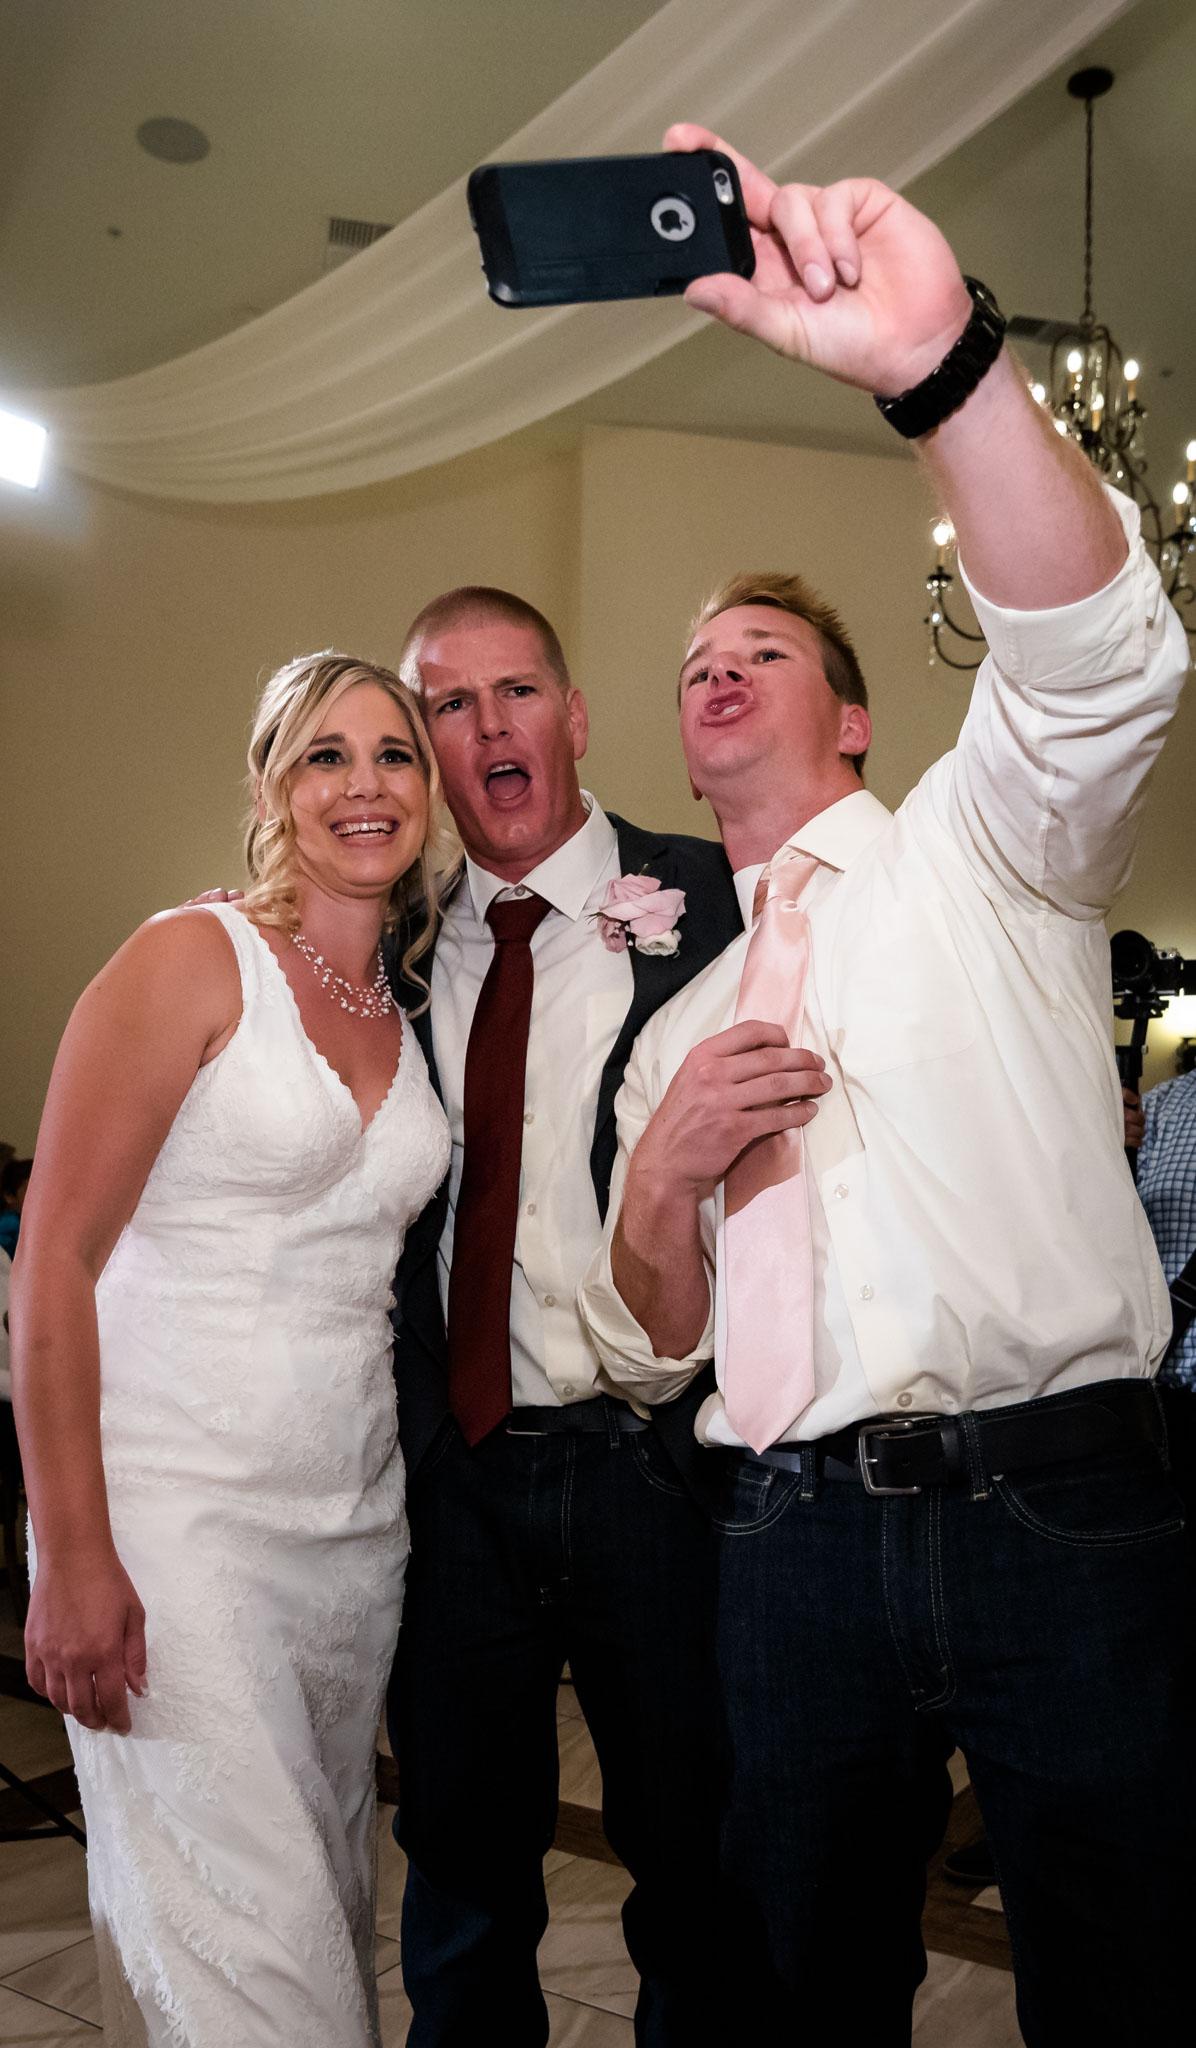 Avensole-Winery-Temecula-Wedding-Josh-and-Olivia-4153.JPG